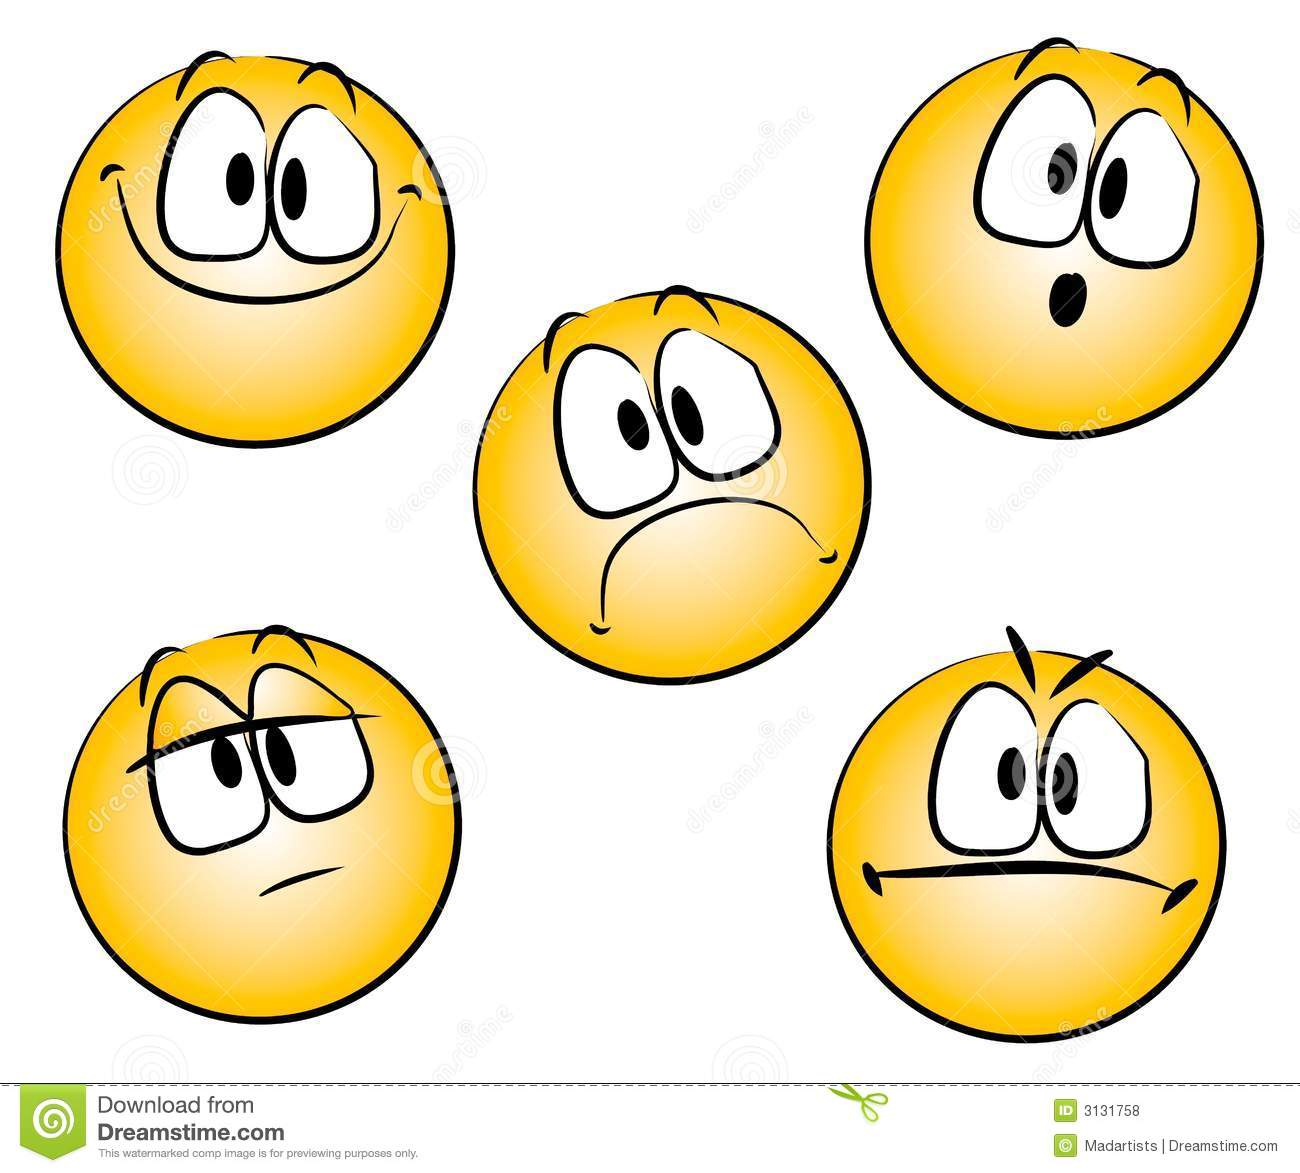 Emoticons Smileys Clip Art Royalty Free Stock Photos Image 3131758